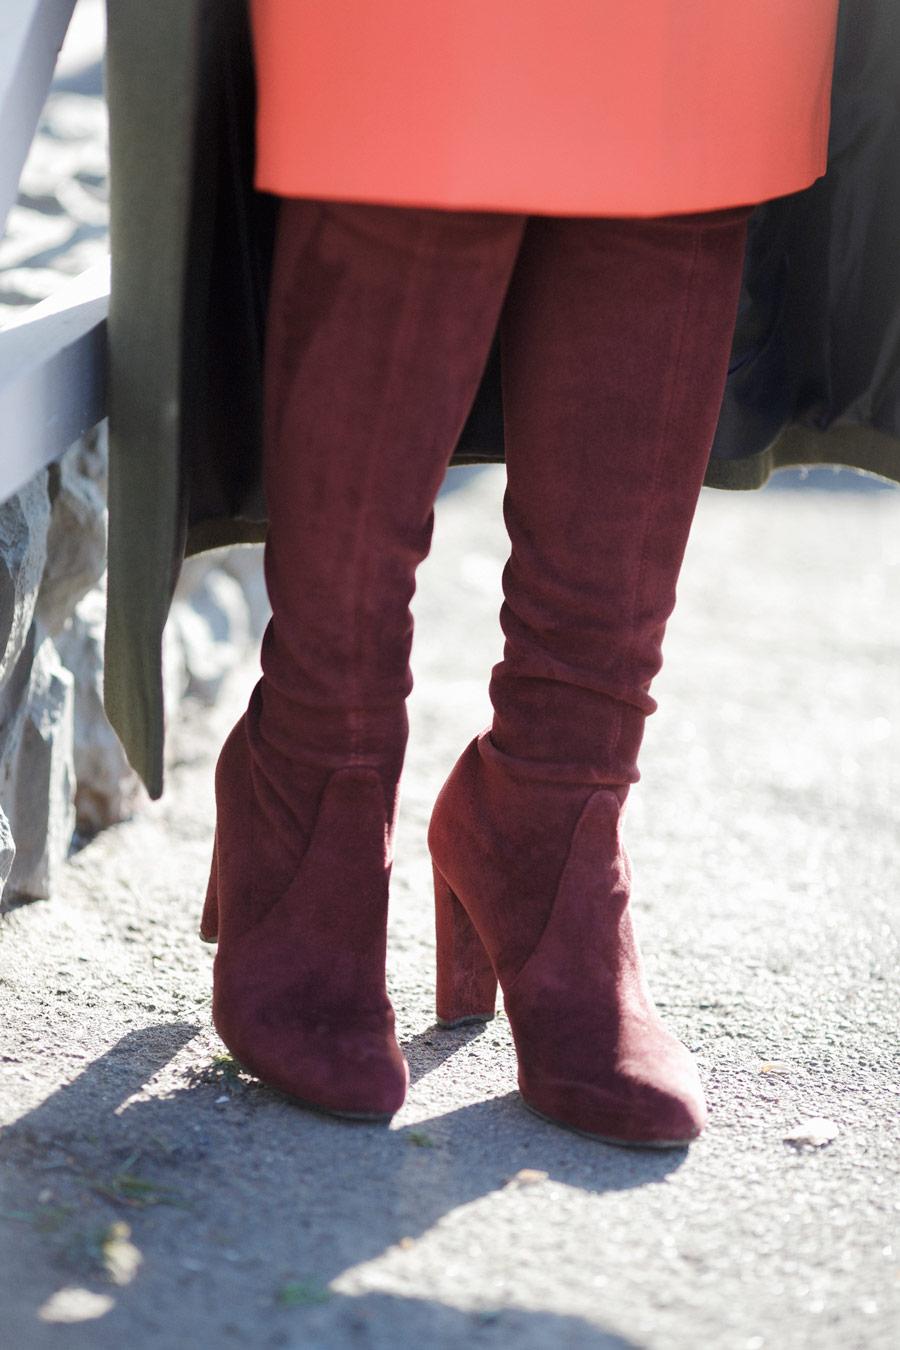 stuart weitzman boots outfits,